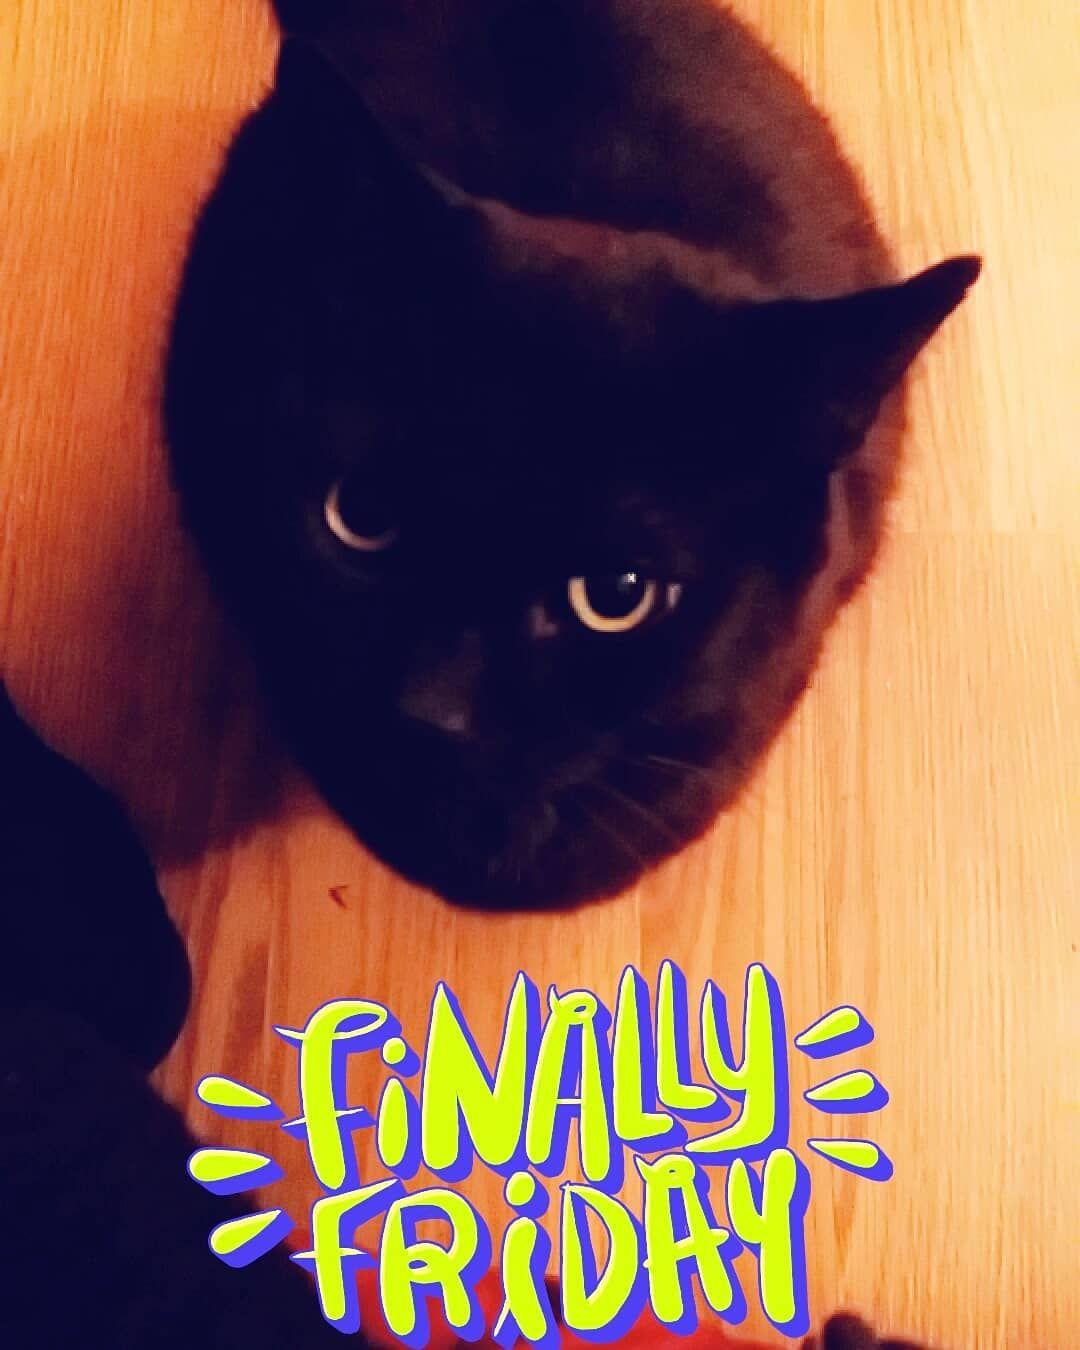 Tgif Tgif Midget Blackcat Catnip Kitty Cattoys Cat Kitten Grouchycat Grouch Meow Morning Goodmorning Friday Tgif Tgif Cat Toys Black Cat Kitty